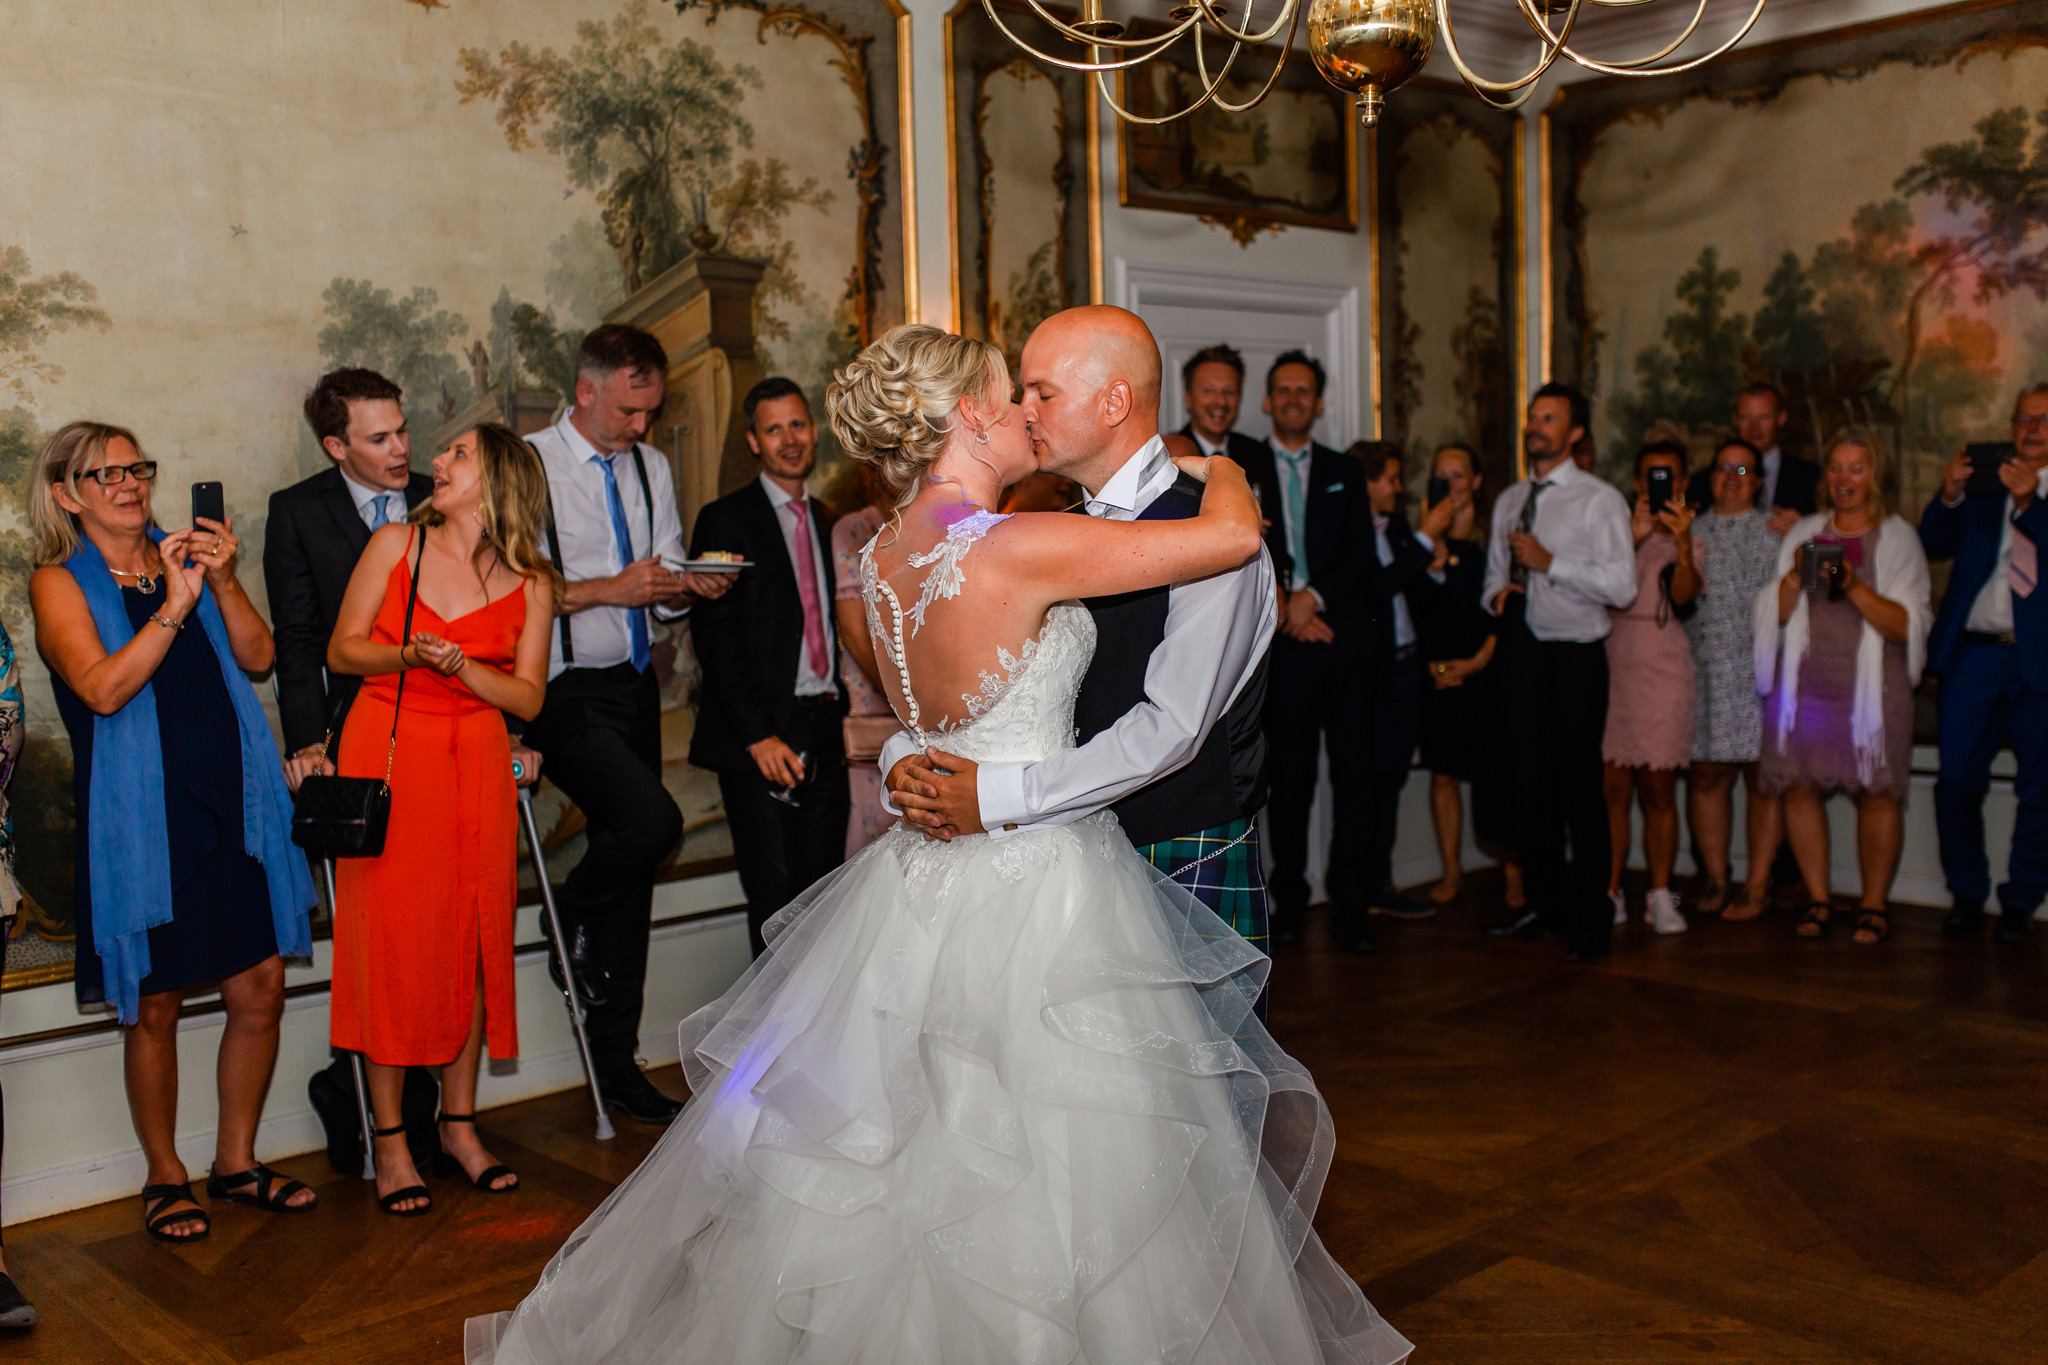 Bröllopsdans på Mauritzberg Slott